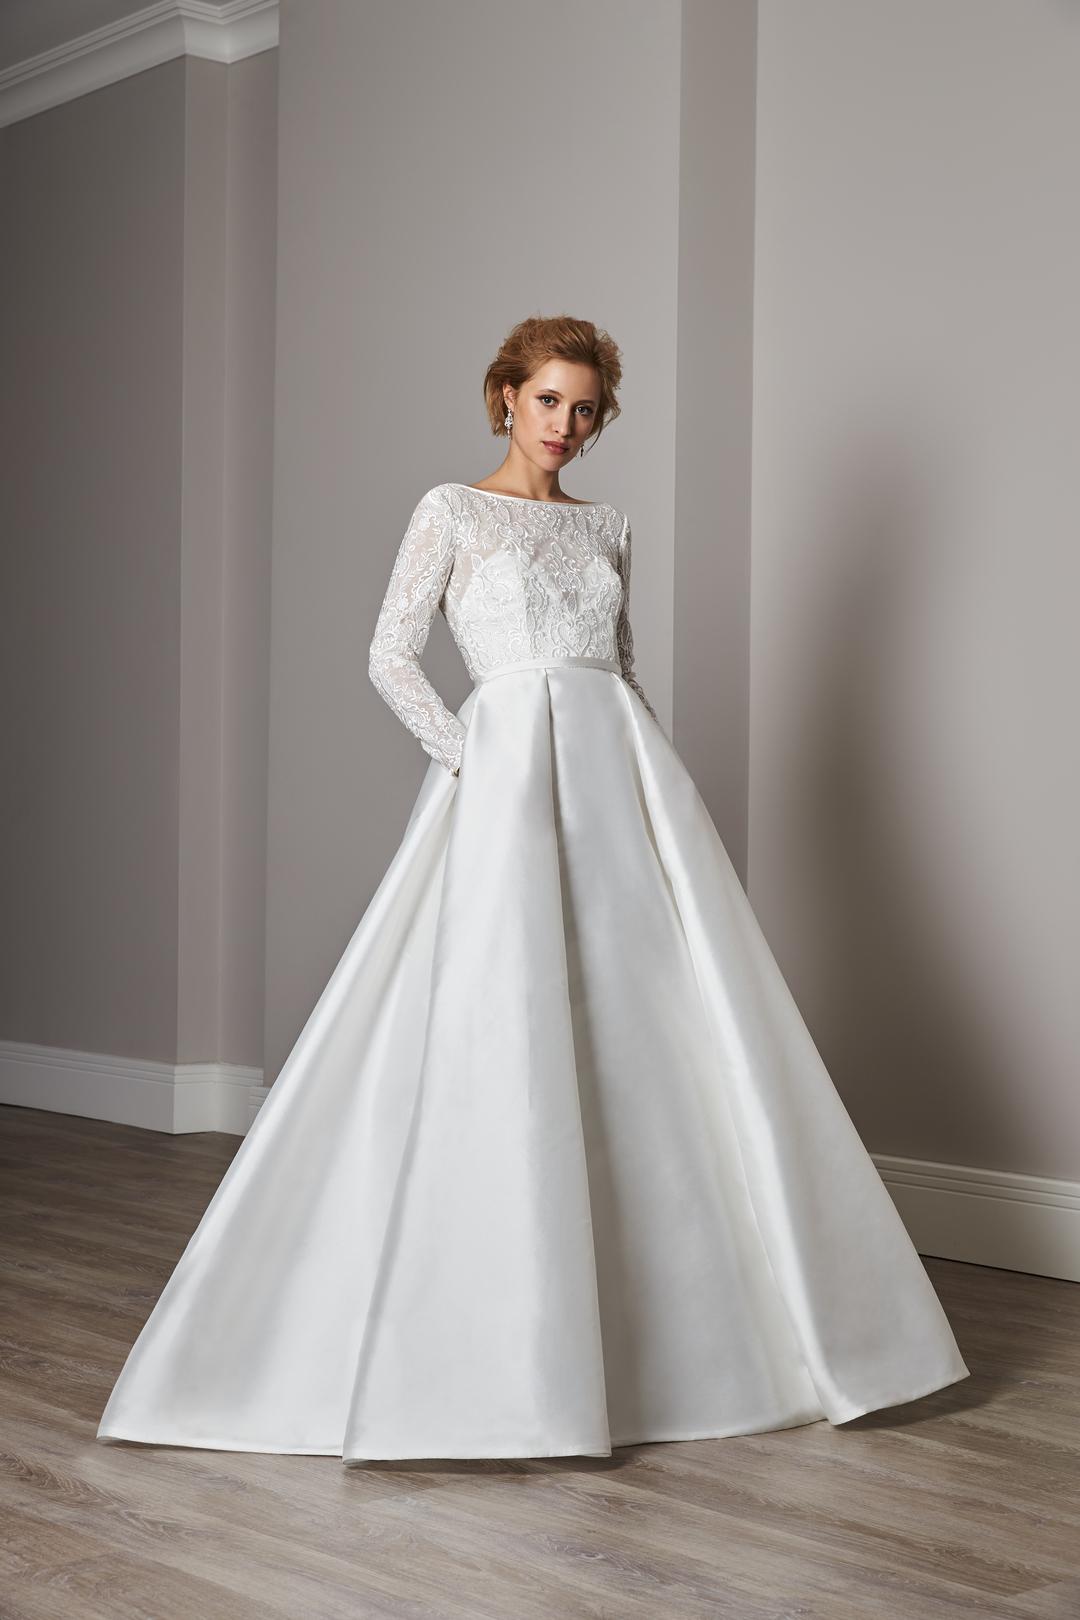 isobel dress photo